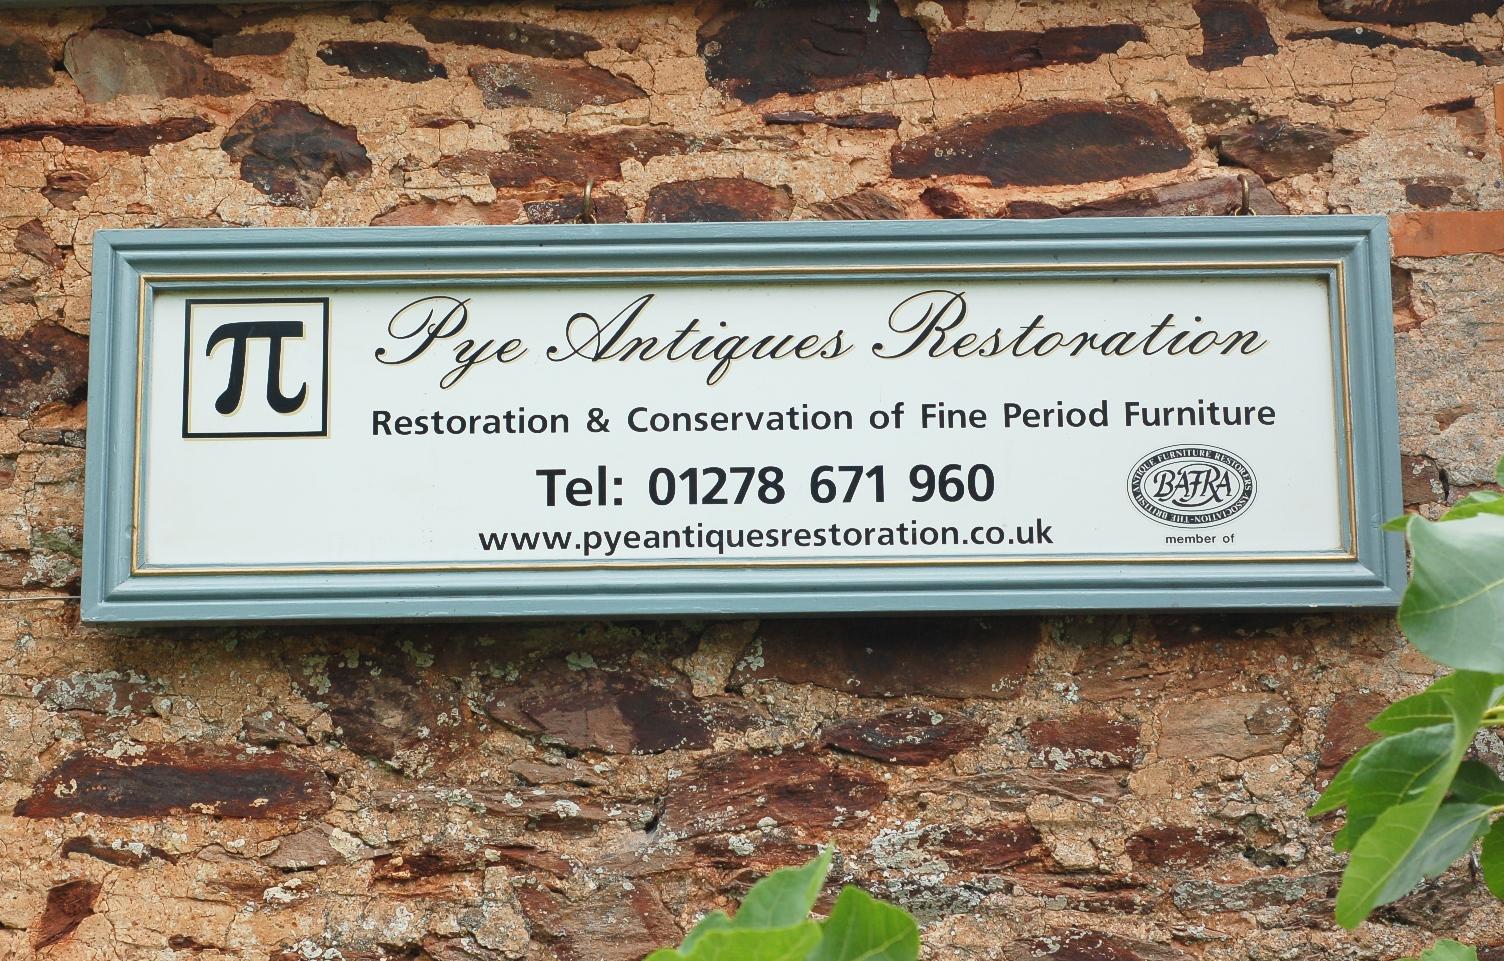 pye antique restoration